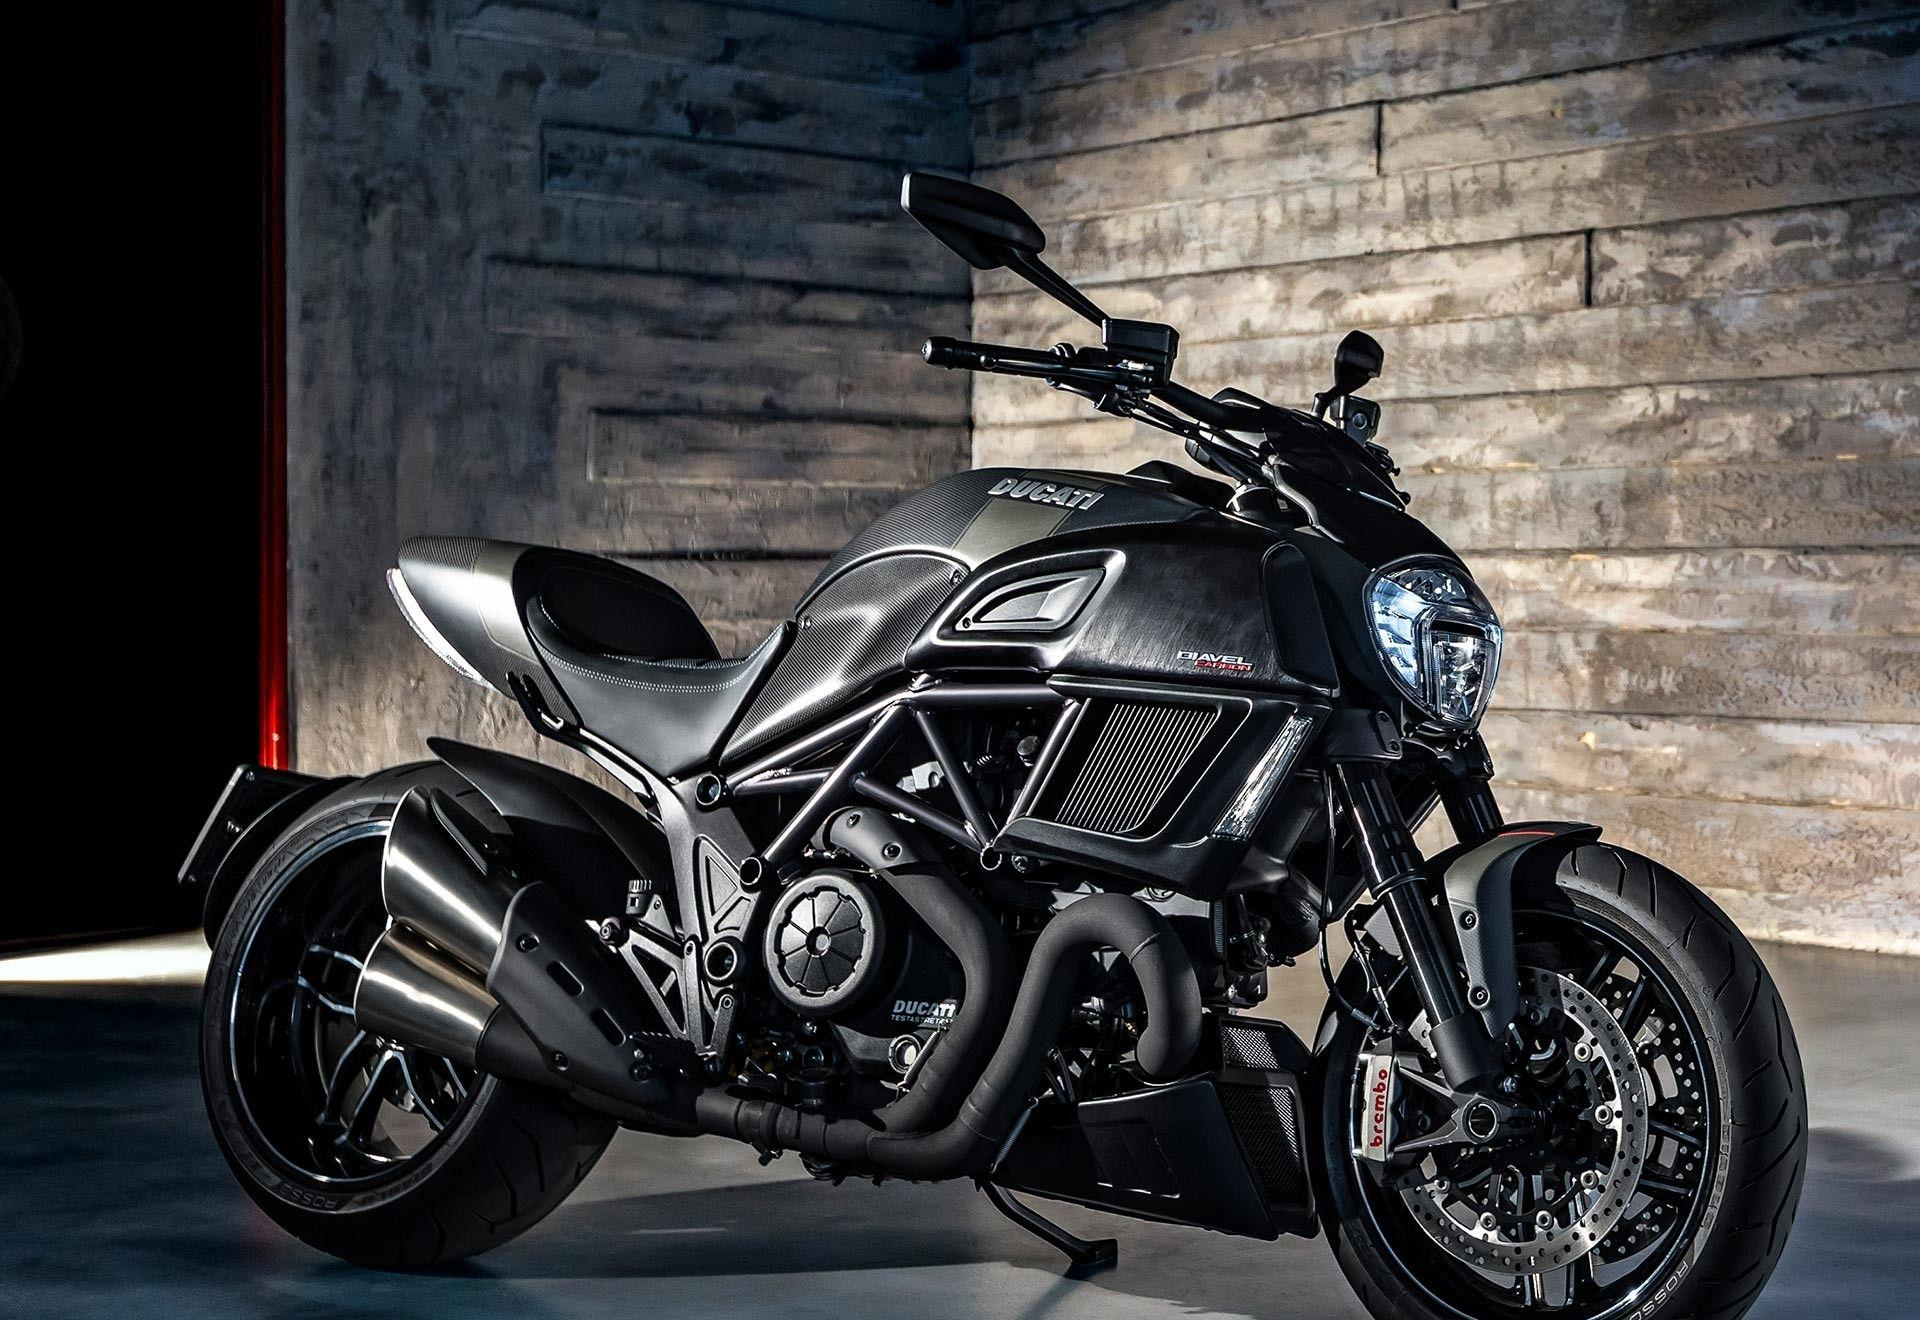 2015 Ducati Diavel Titanium Wallpapers 53 HD